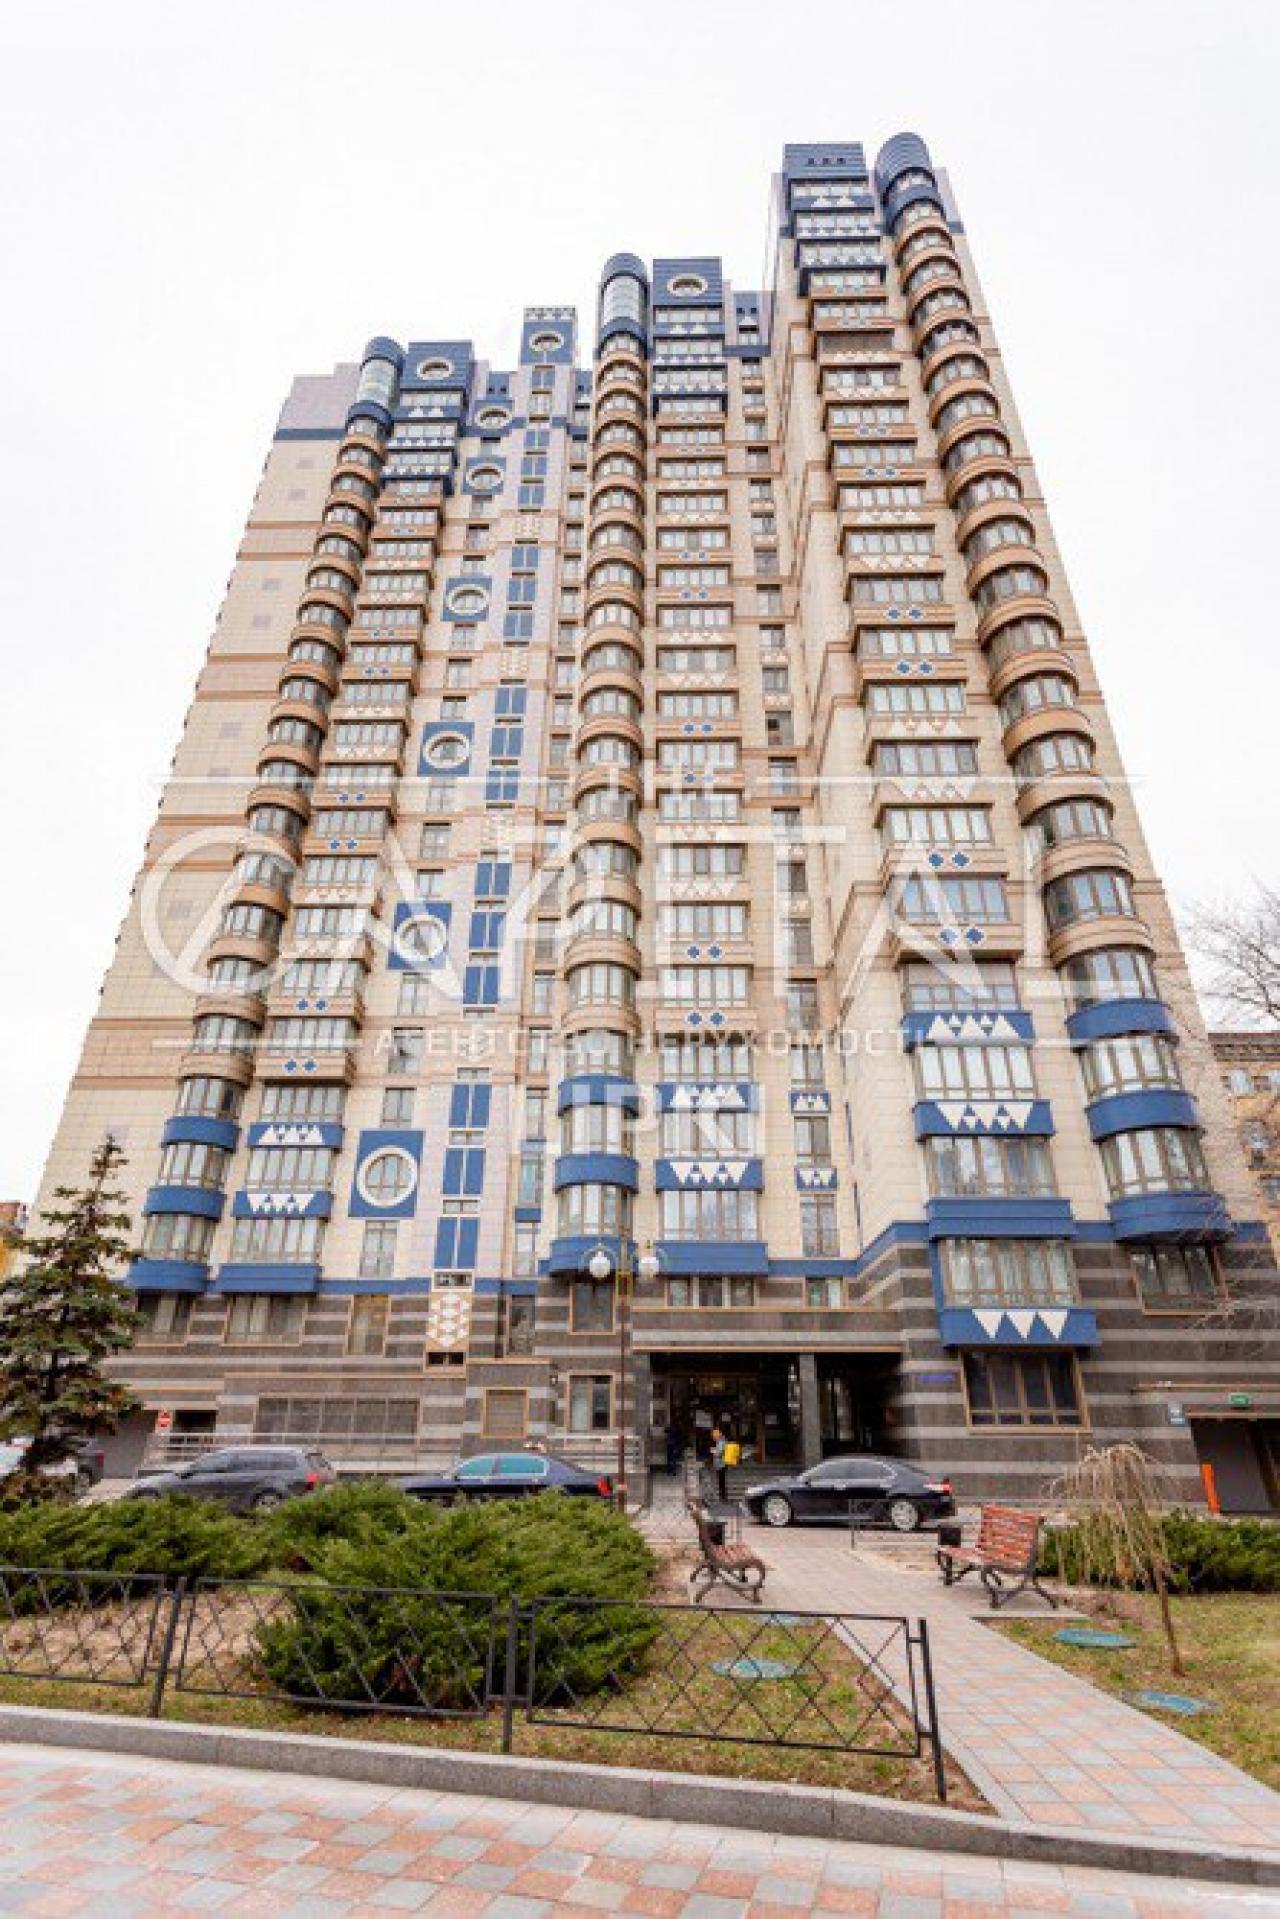 Продажа 6 комн. квартиры Институтская 18а за 3145000 USD